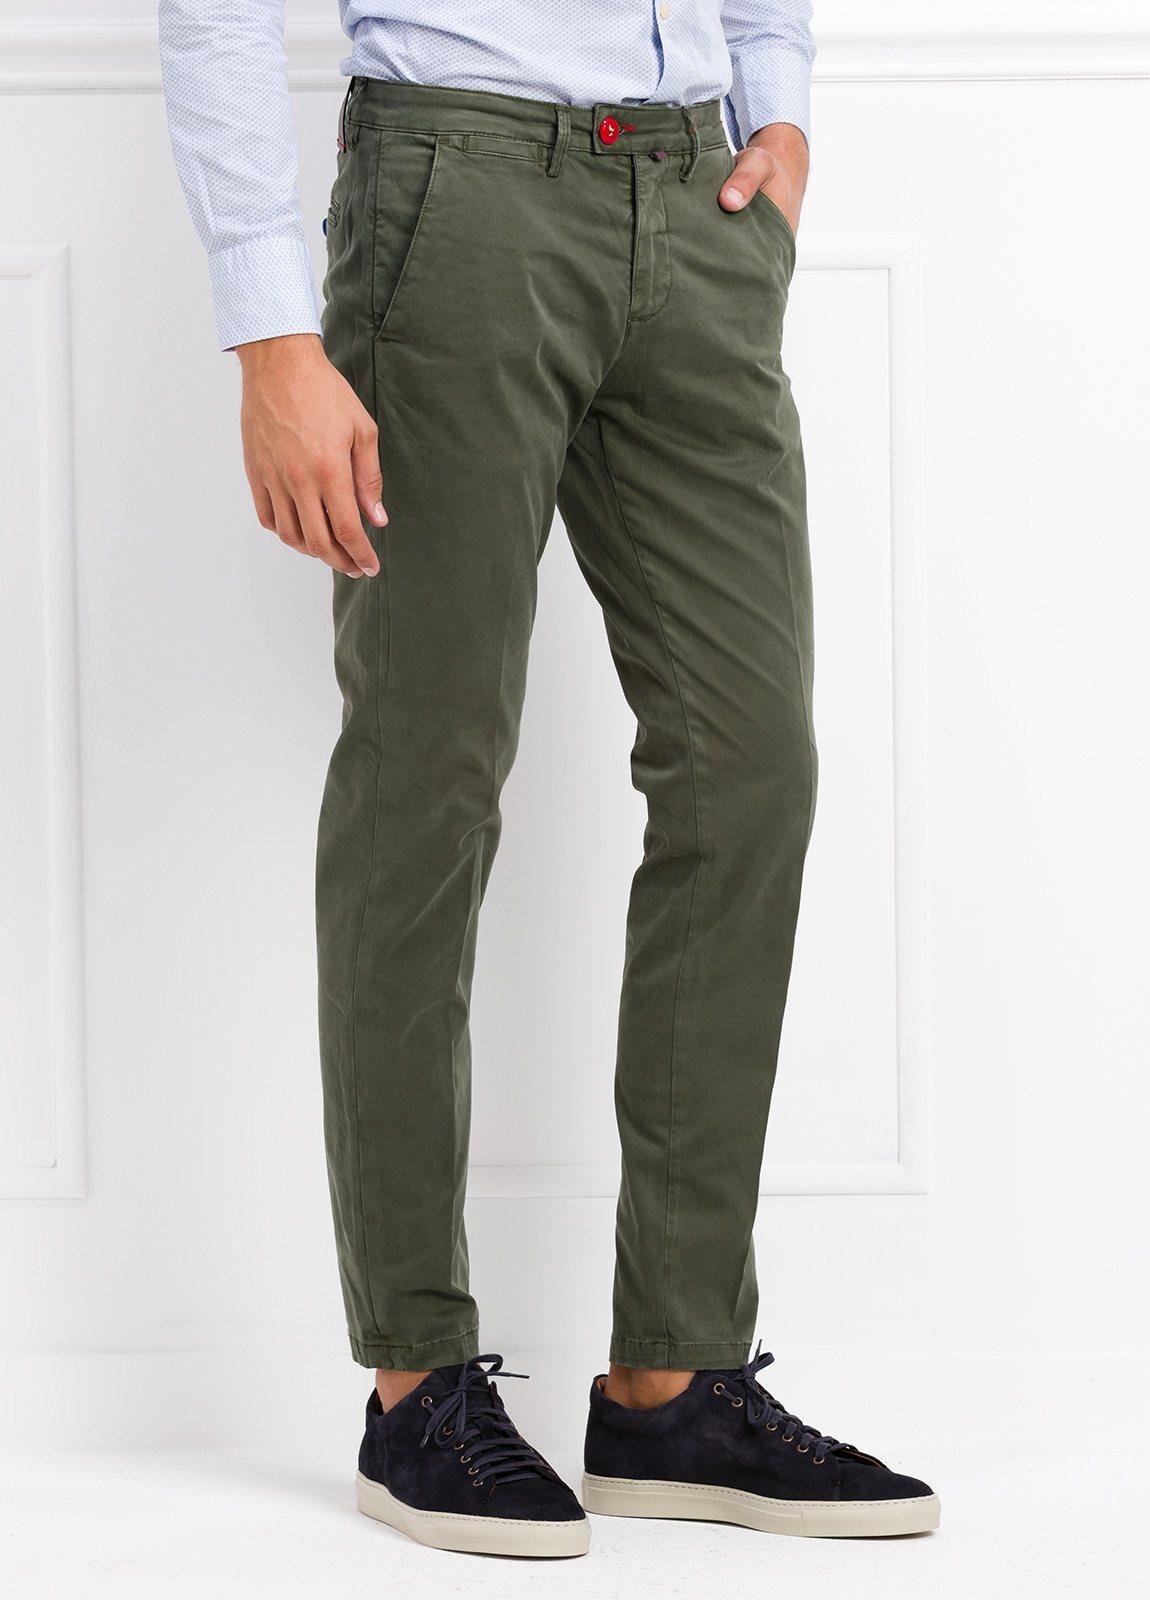 Pantalón chino color verde kaki. 97% Algodón 3% Ea. - Ítem1